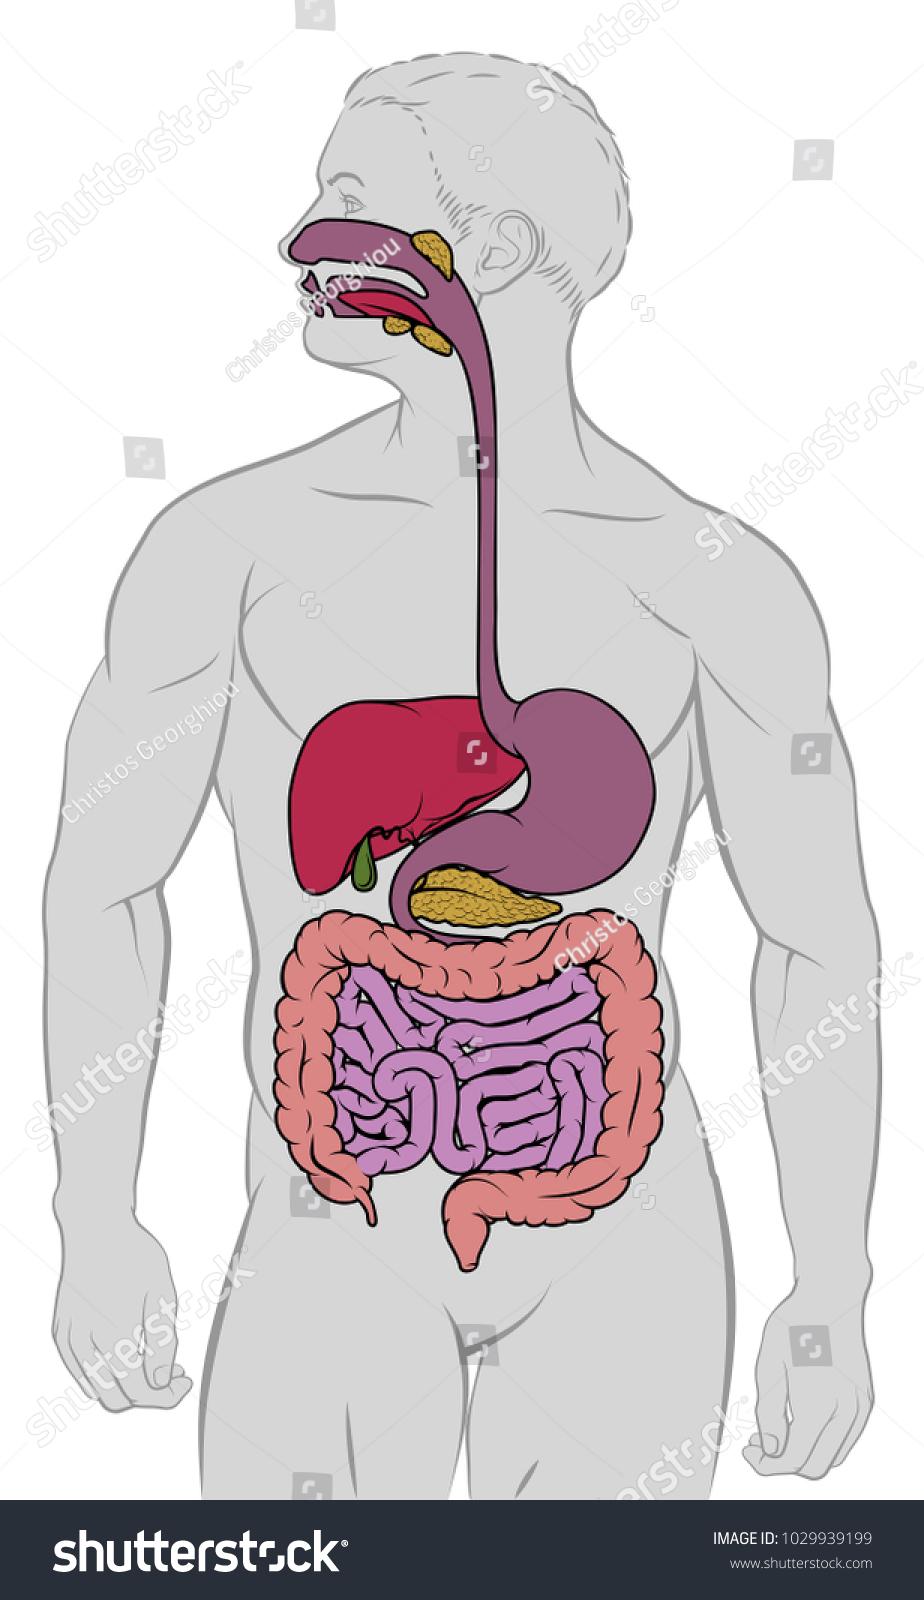 Human Anatomy Digestive System Gut Gastrointestinal